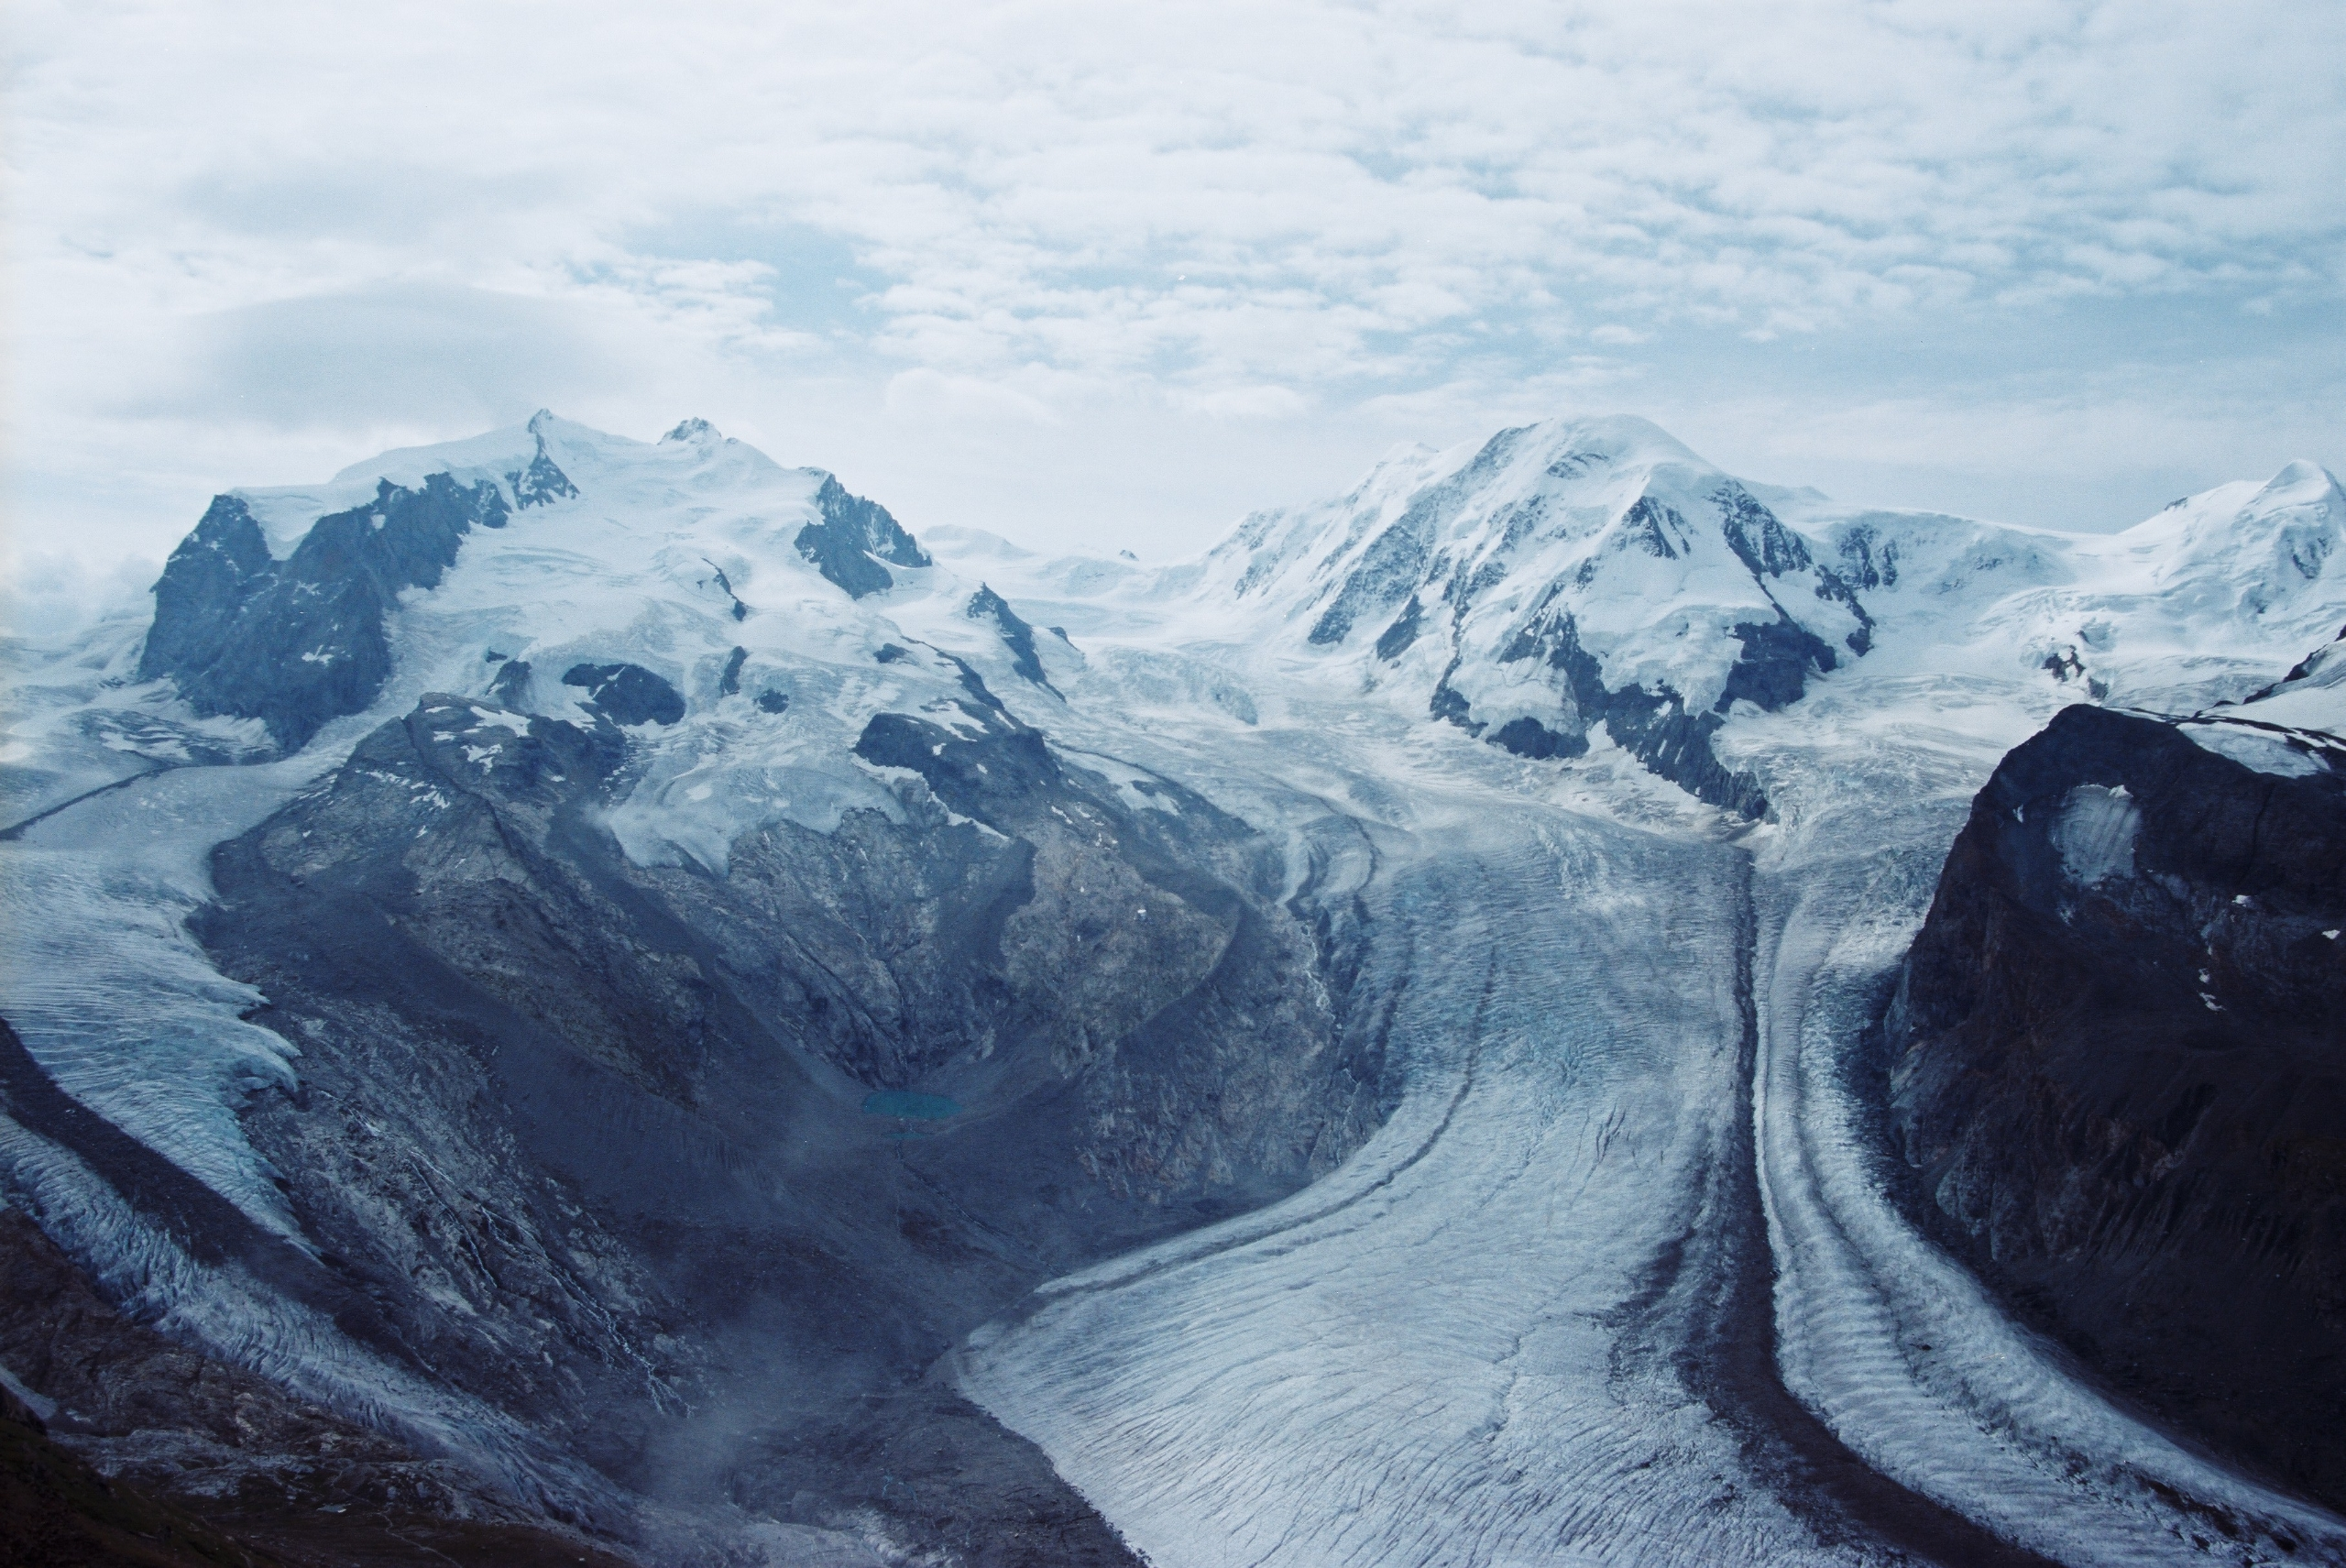 Gornergrat Glacier 〜 Zermatt, S - ferreira-rocks | ello